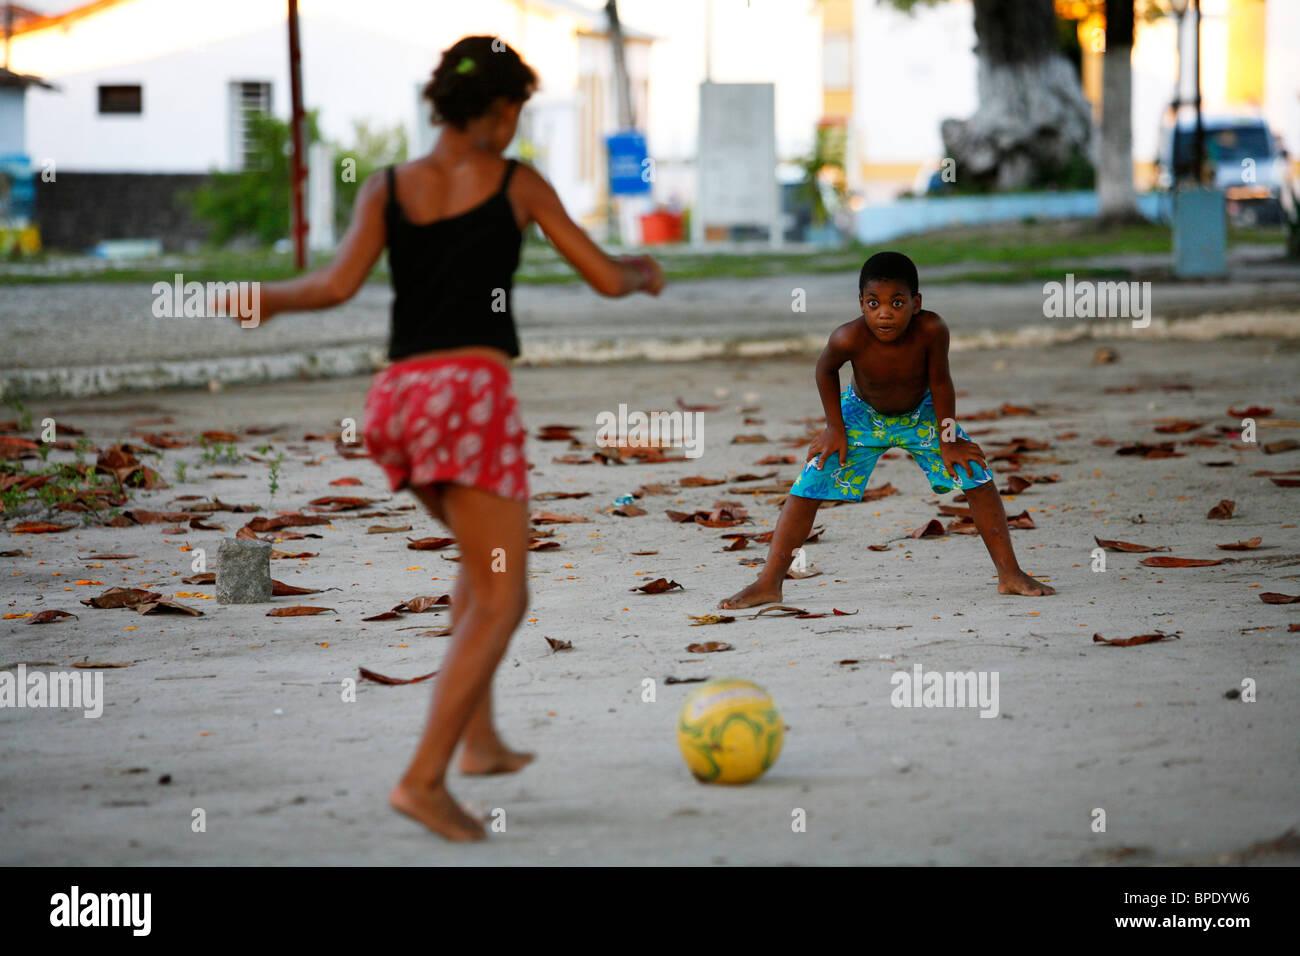 Ragazzi che giocano a calcio a Arraial d'Ajuda, Bahia, Brasile. Immagini Stock